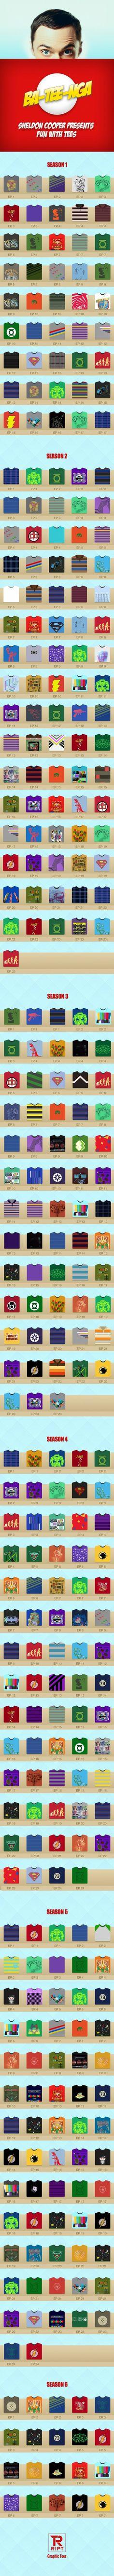 Bazinga! Todas las franelas de Sheldon en una infografía (via @Geek's Room y via @zitelmann)